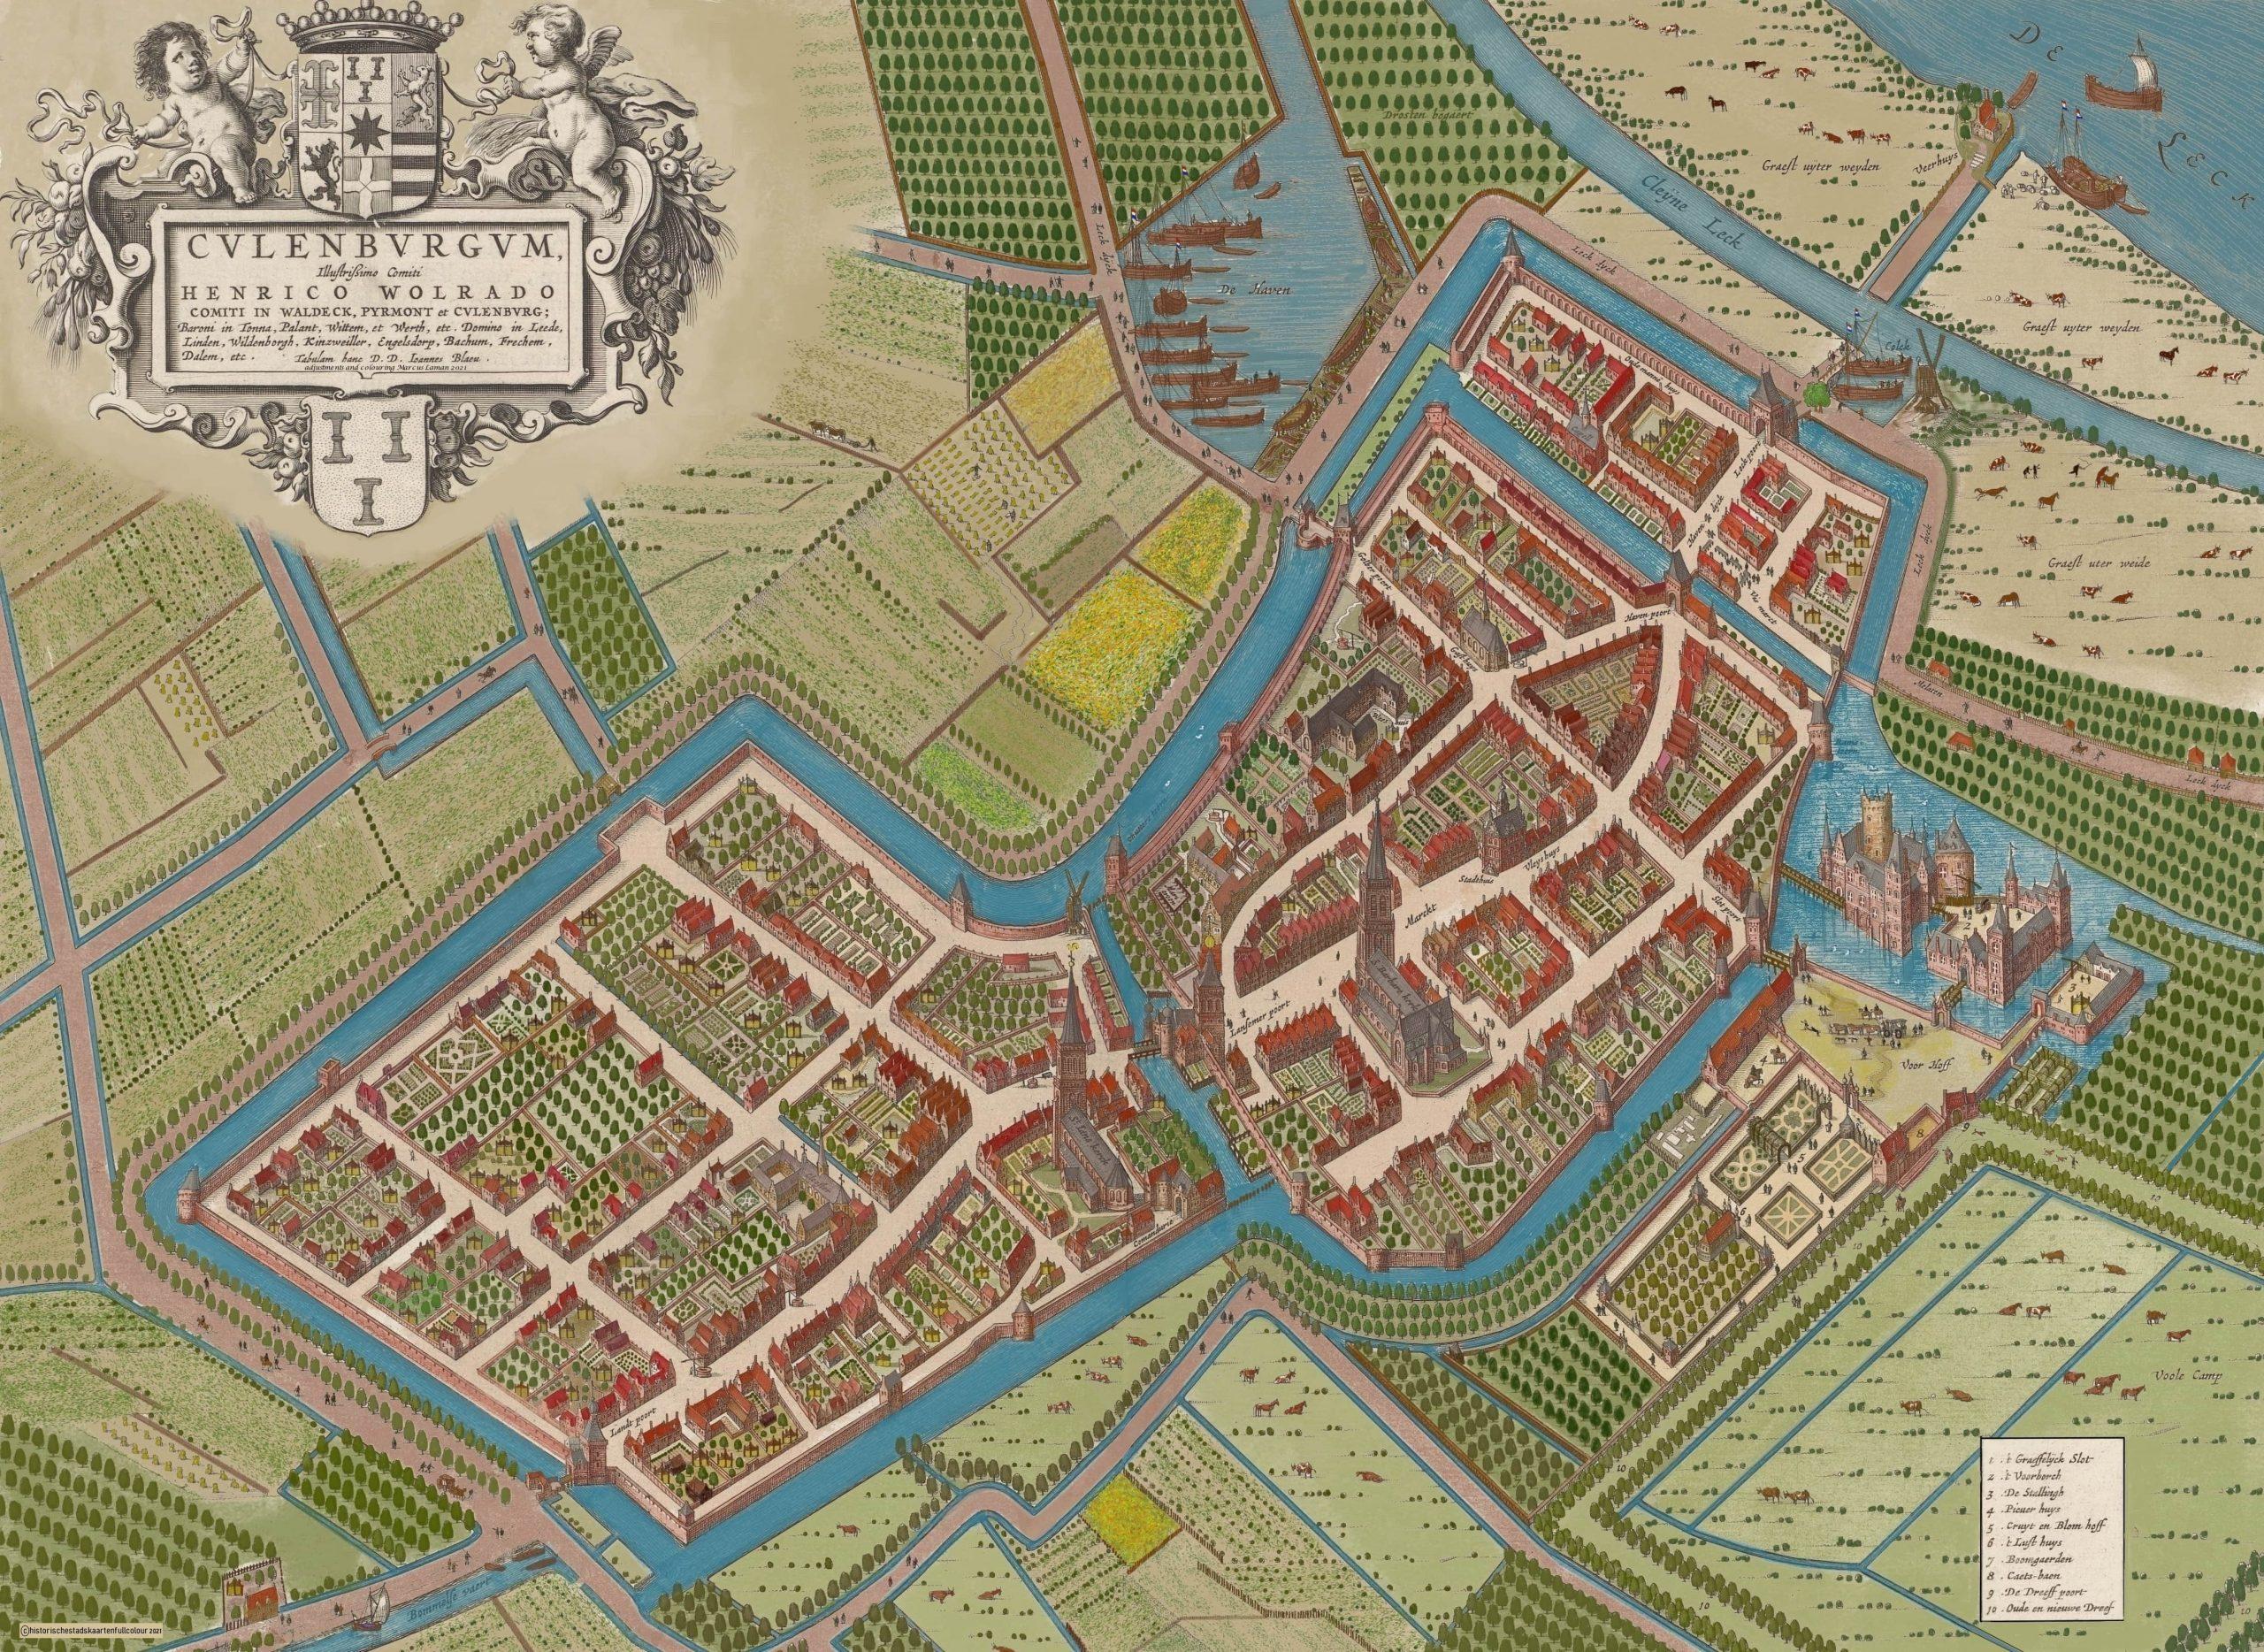 Culemborg, Johannes Bleau GEKLEURD-min